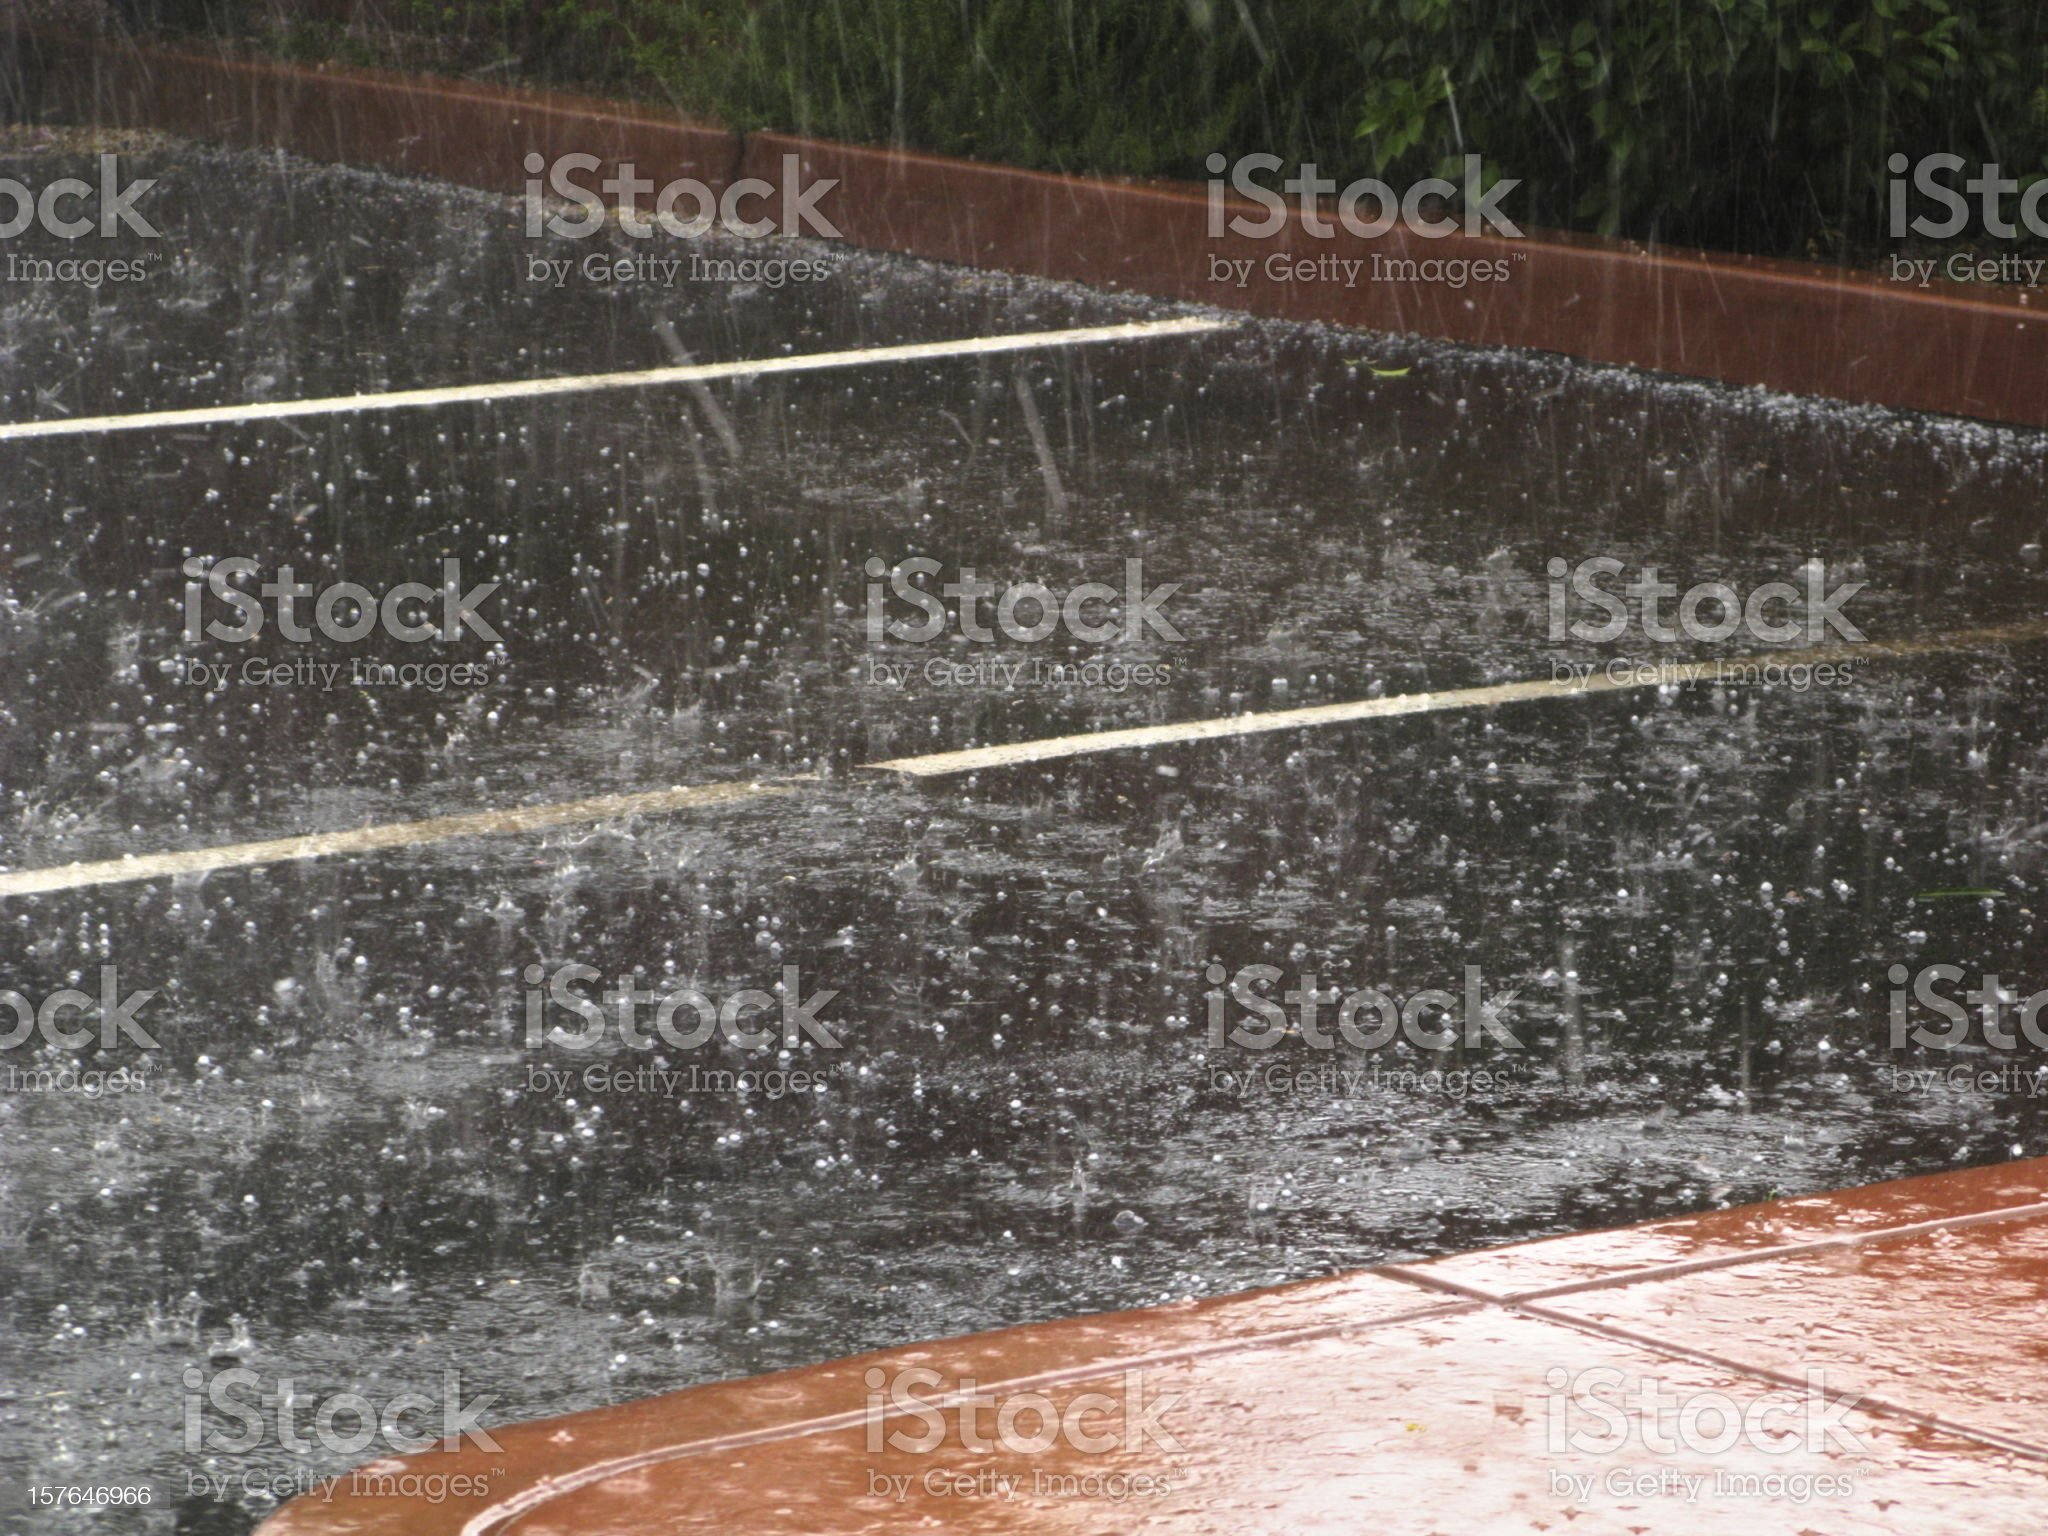 Hailstone Storm Hailstorm Parking Lot royalty-free stock photo